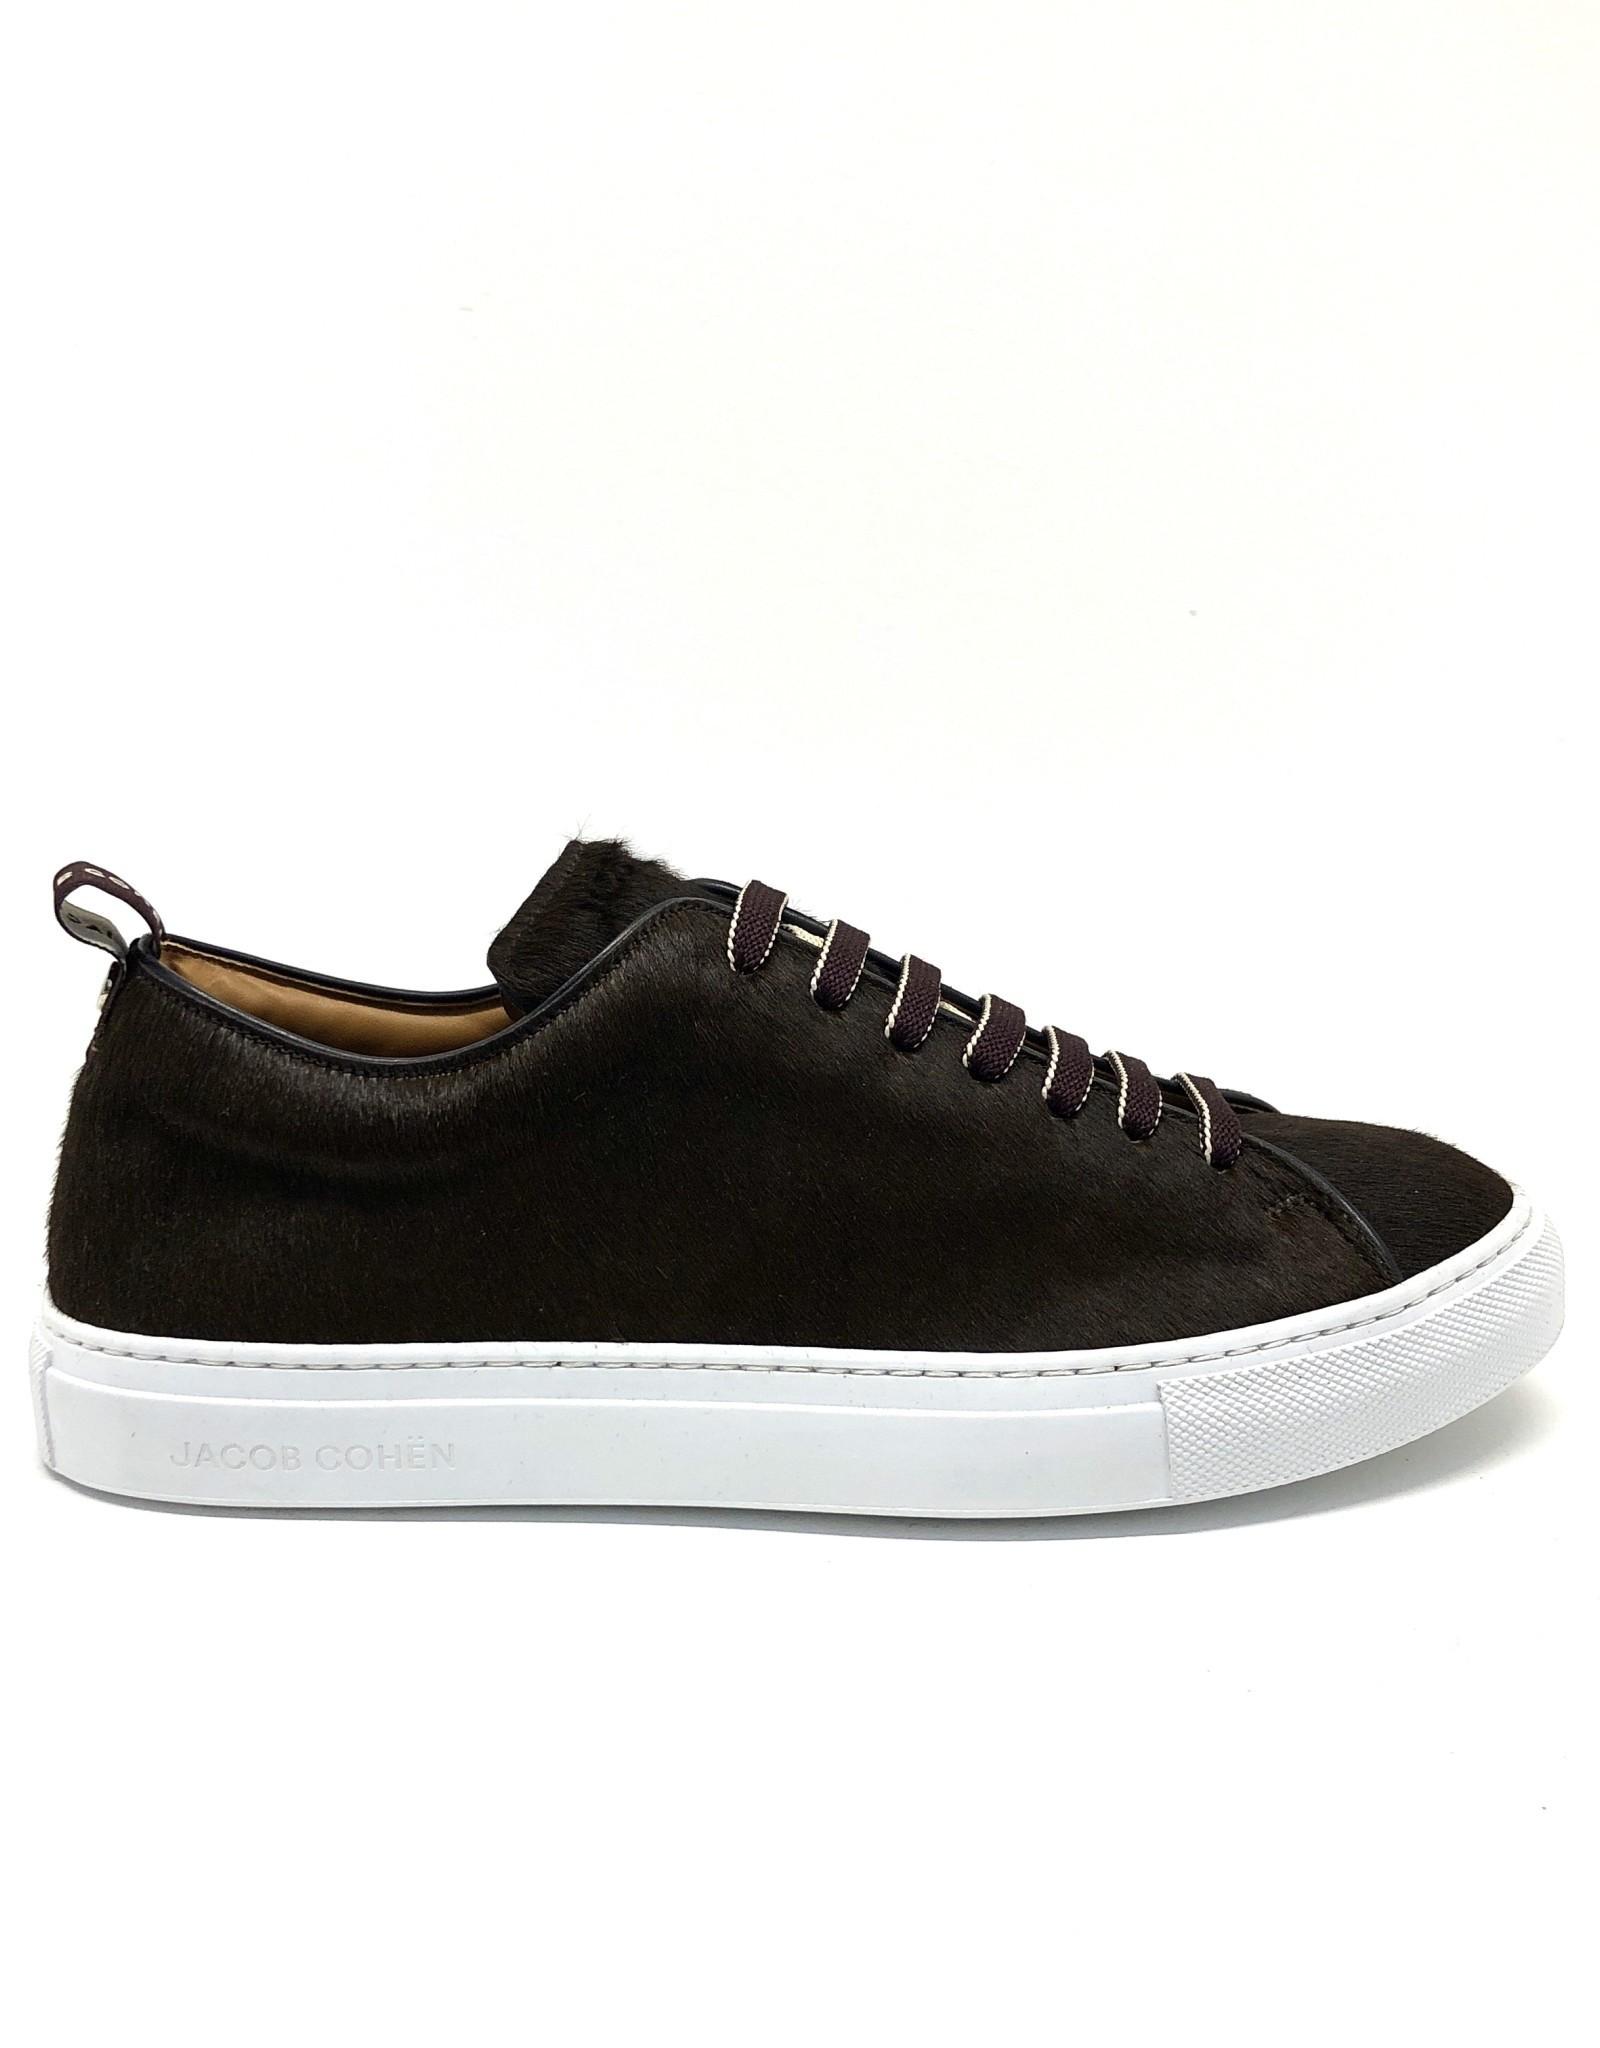 Sneakers BOB JCC866 Brown